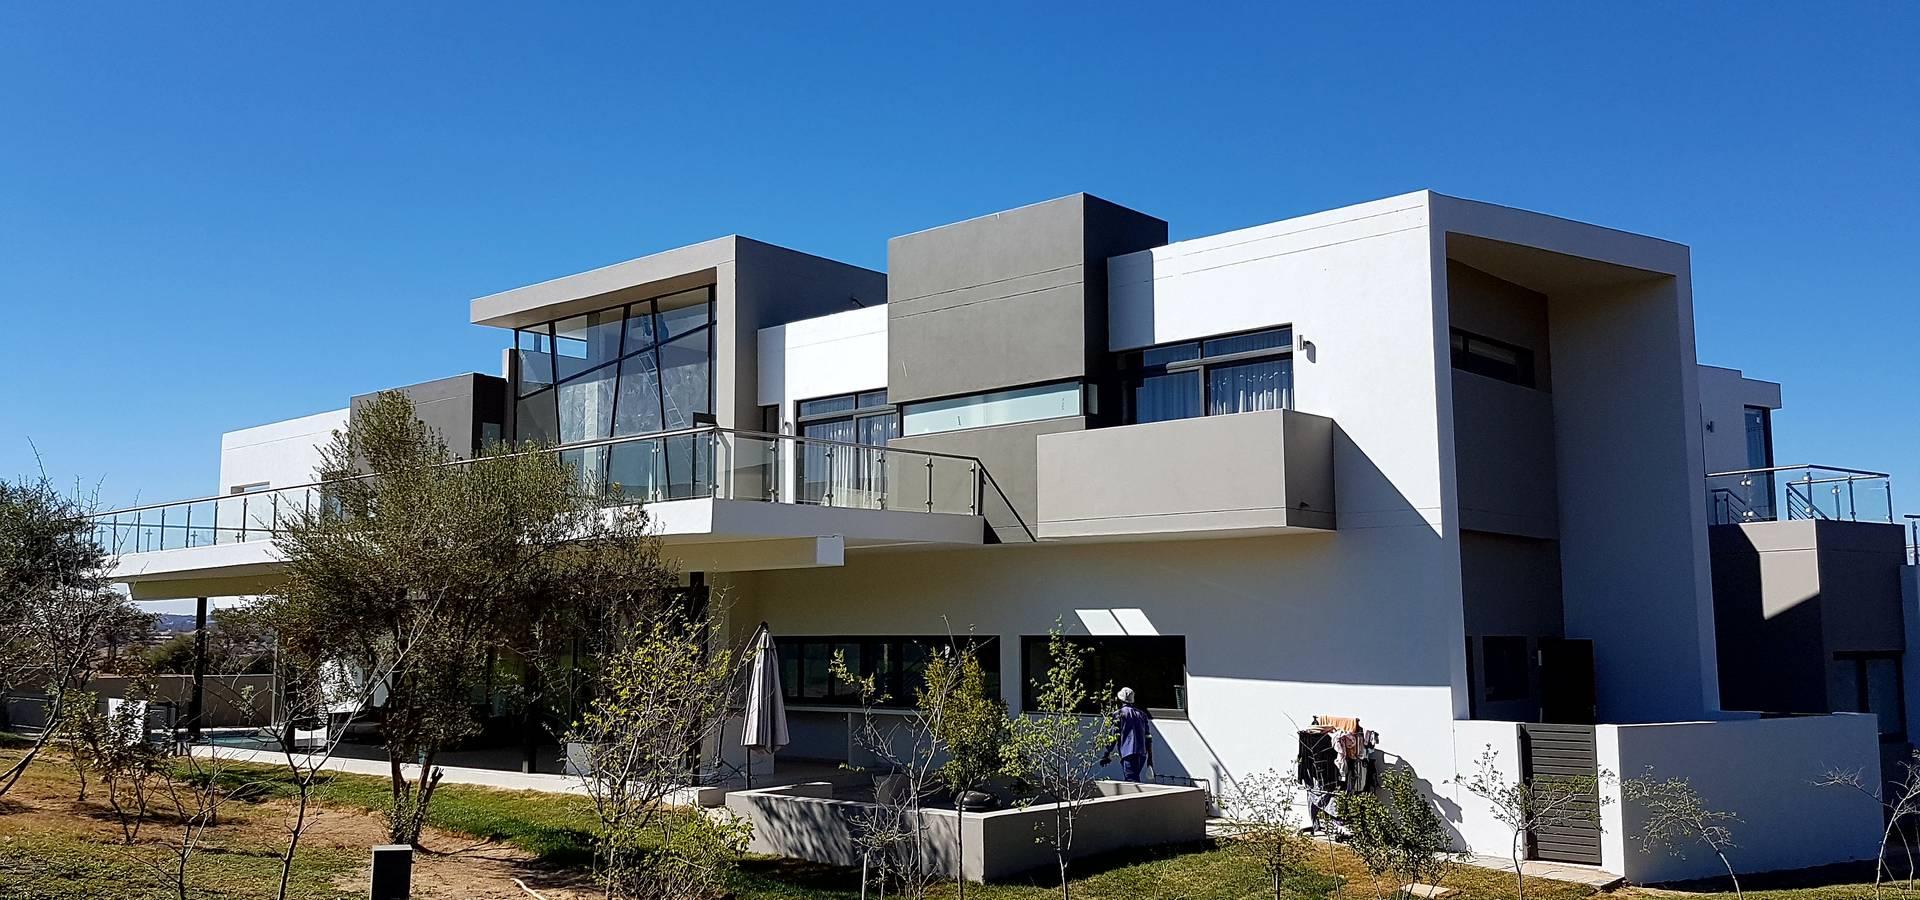 AVR Architects